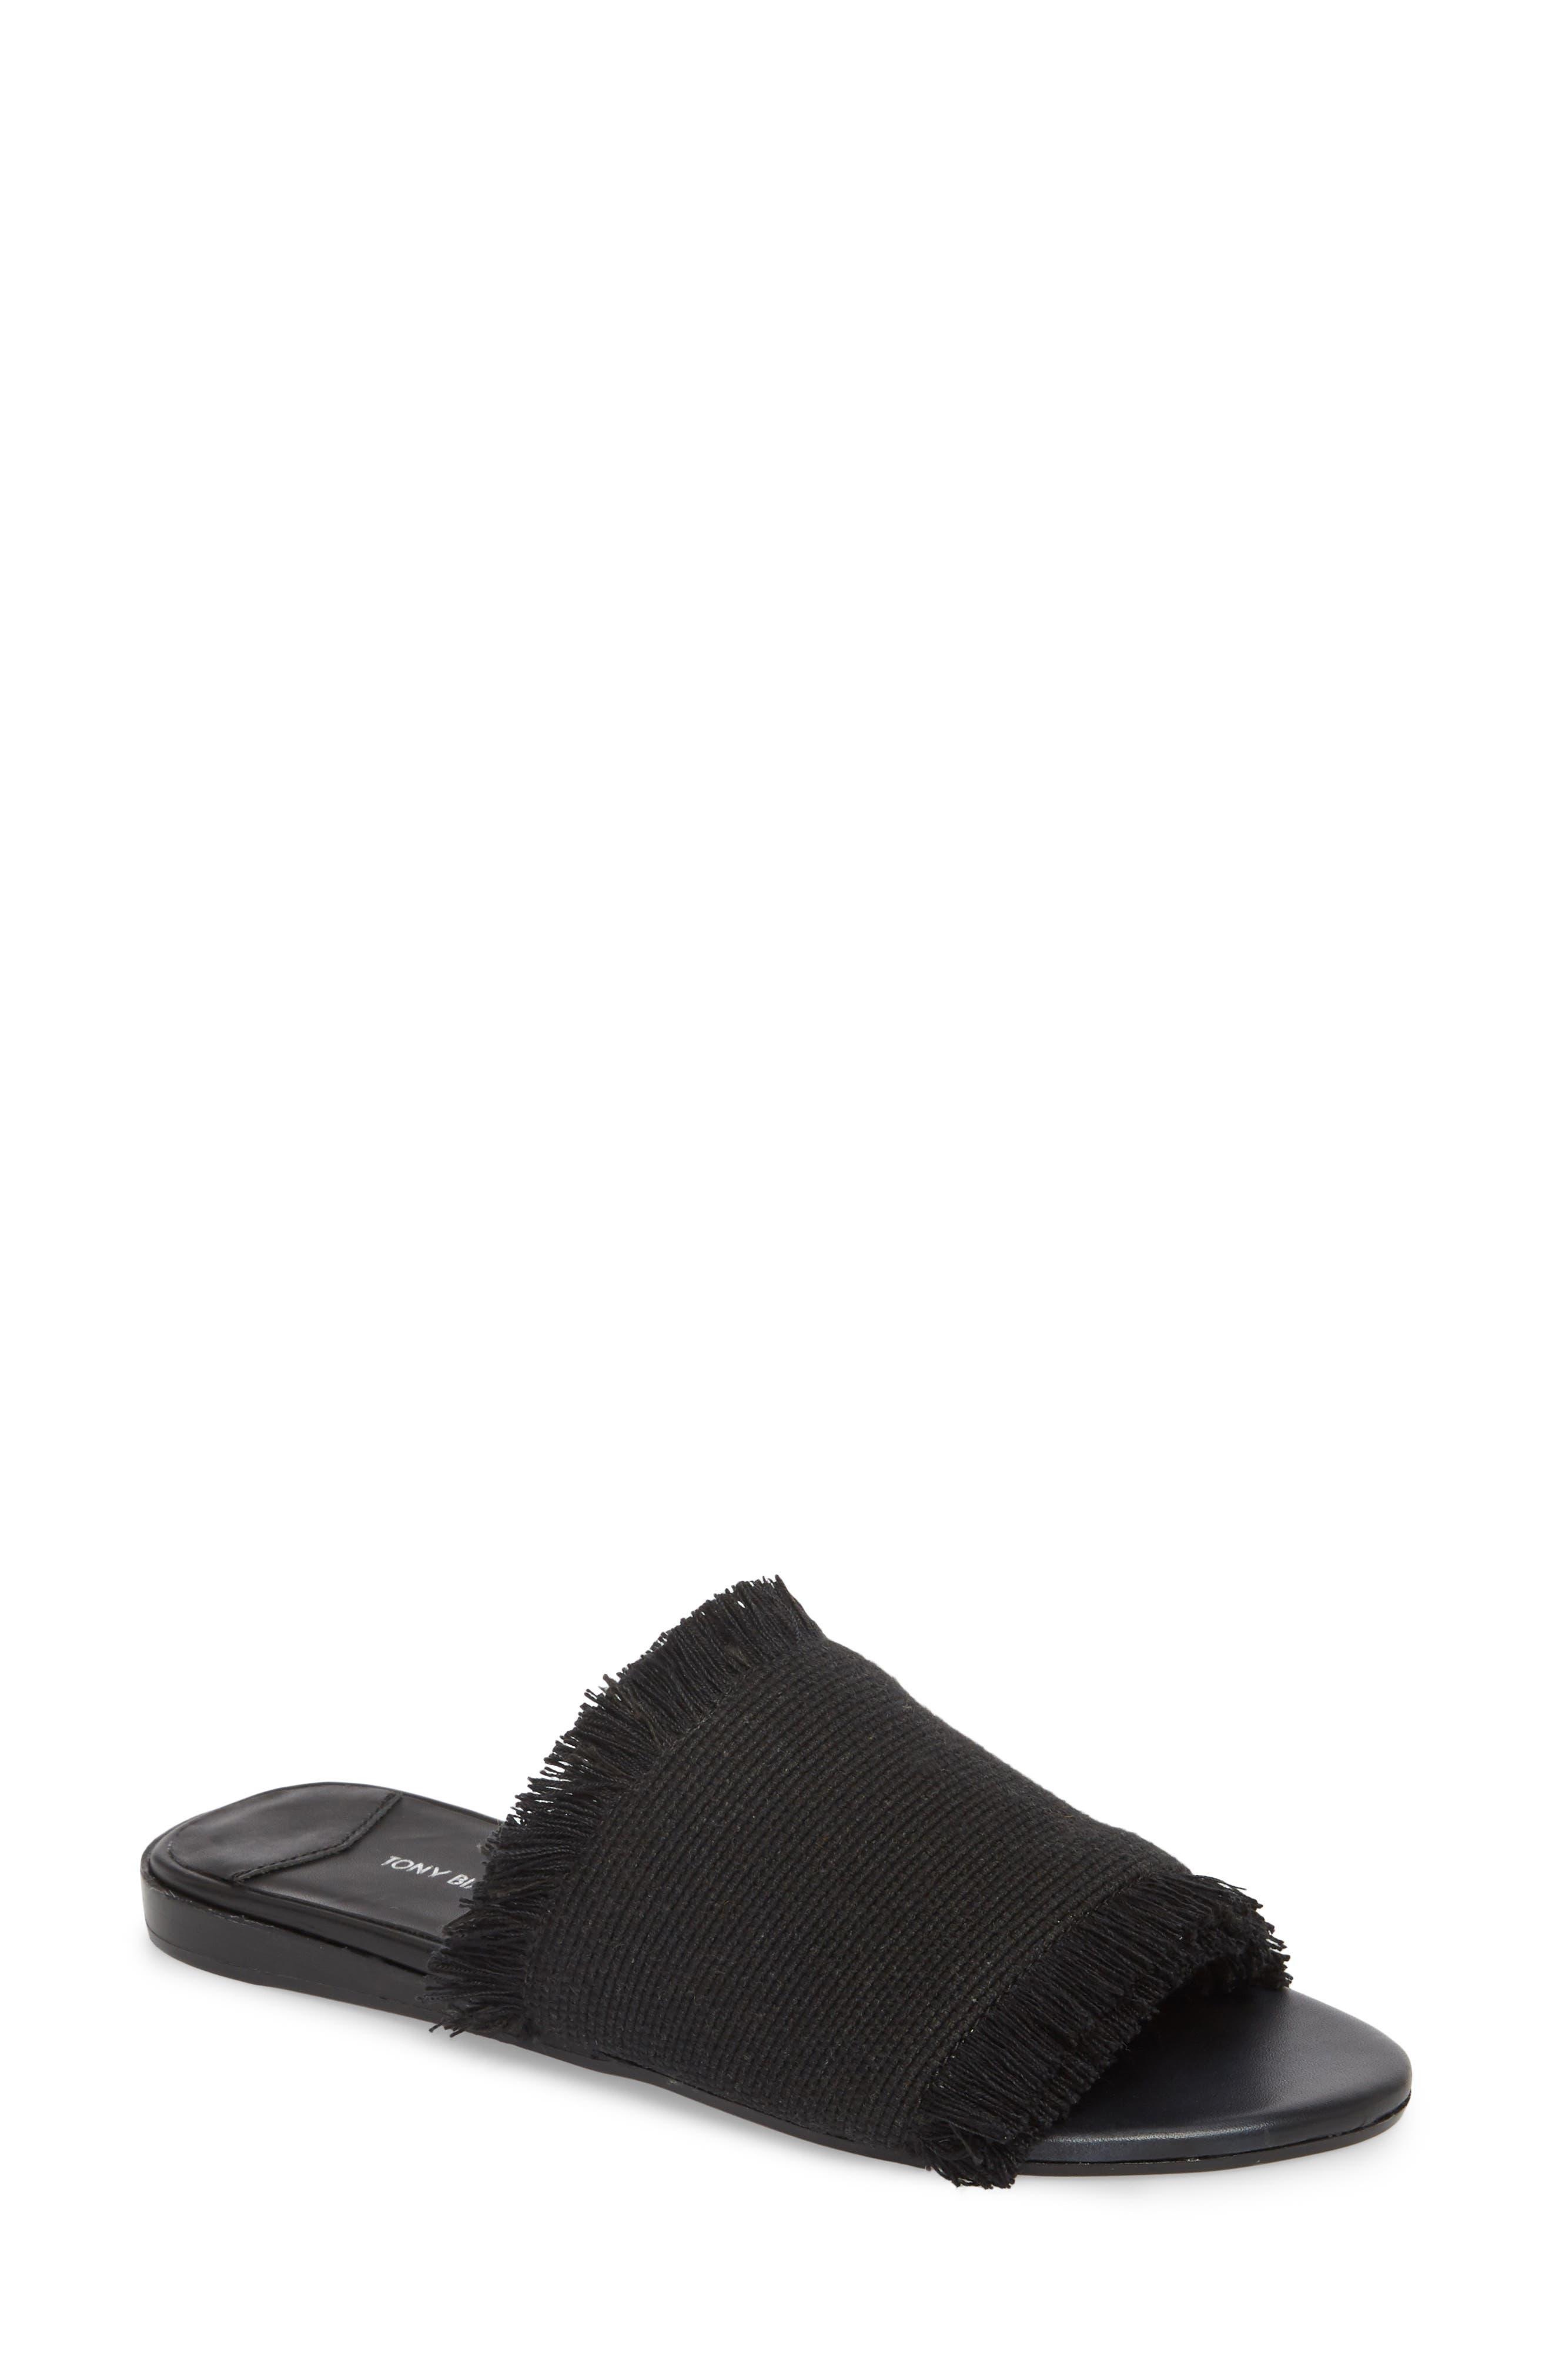 Tony Bianco Jayd Slide Sandal, Black